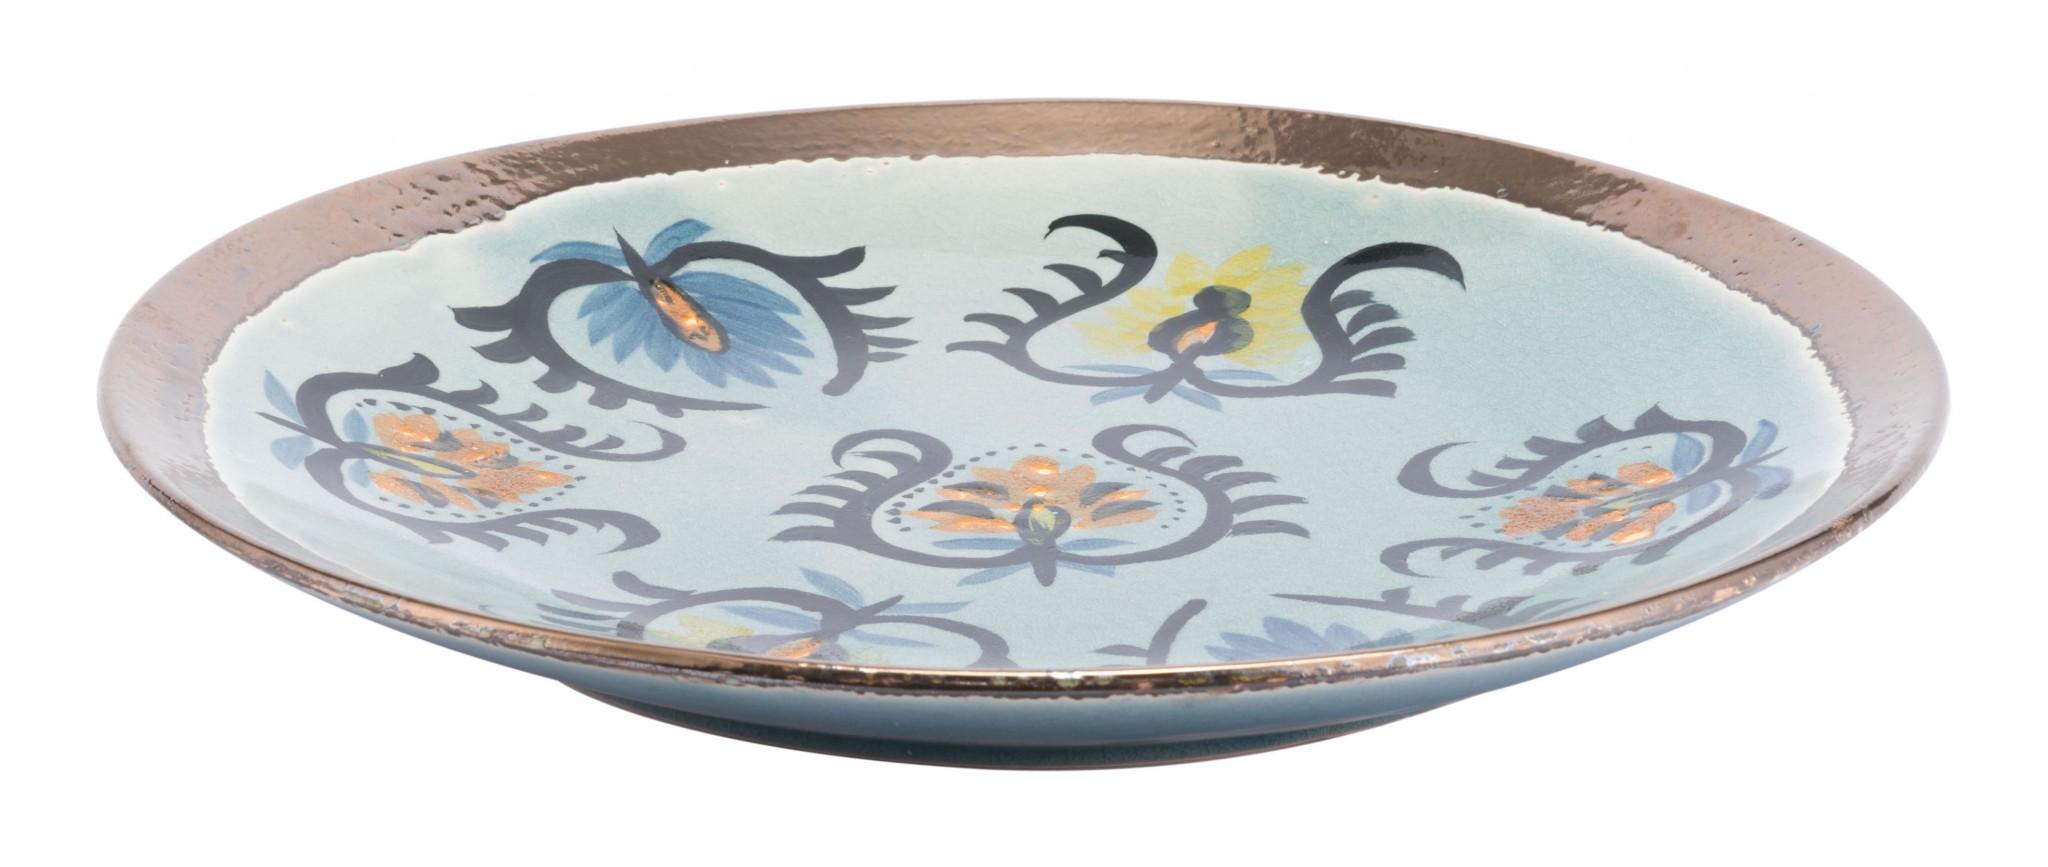 "16.5"" x 16.5"" x 2"" Multicolor, Ceramic, Plate"